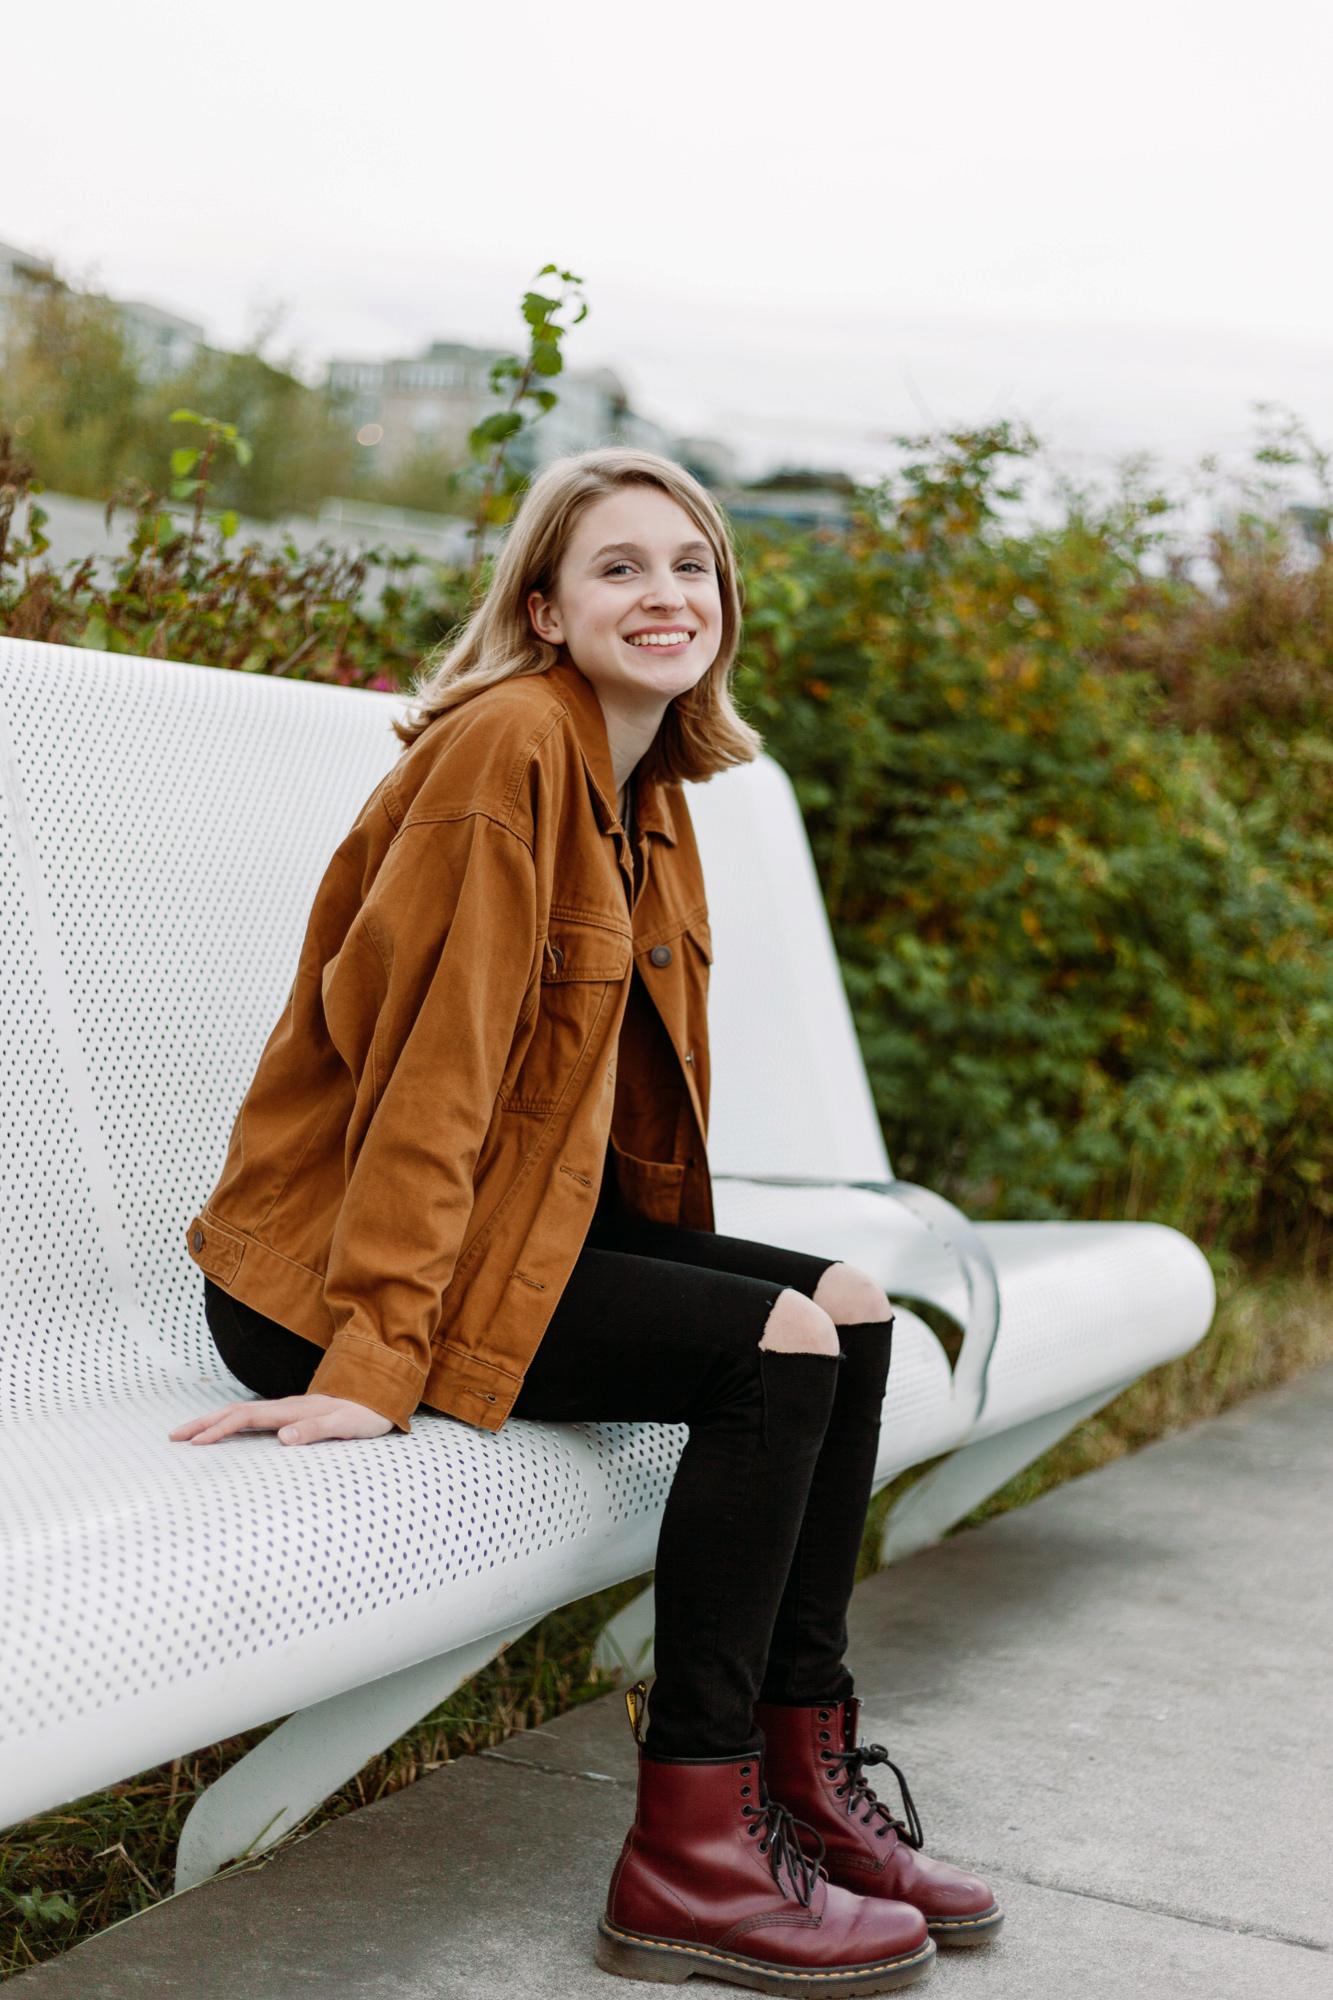 LaurenSenior-HaleyMcLain9.JPG